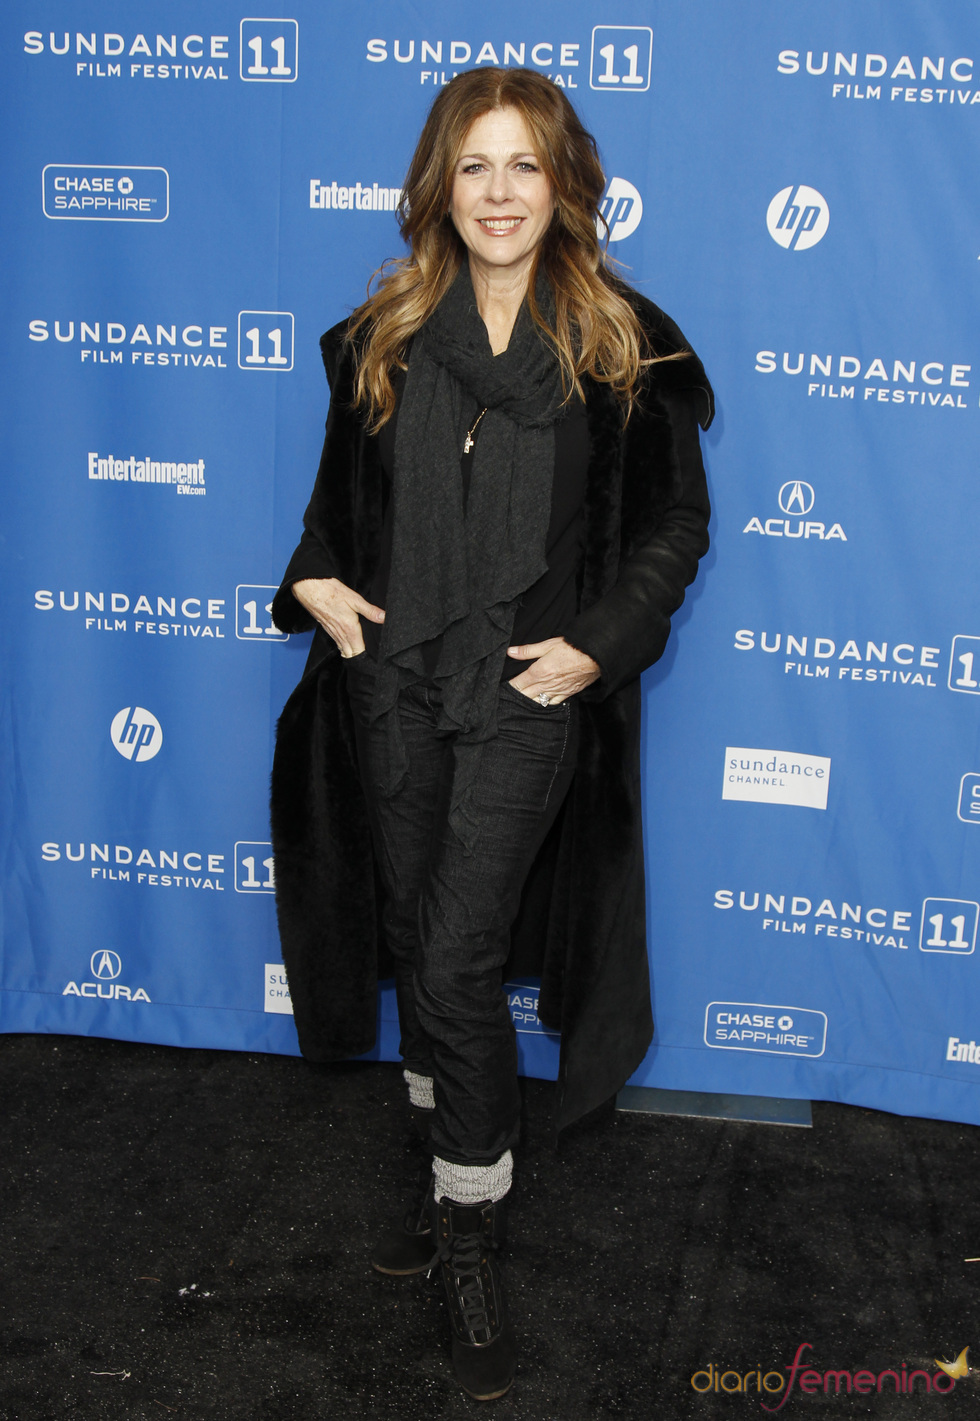 Rita Wilson en el Festival de Cine Sundance 2011